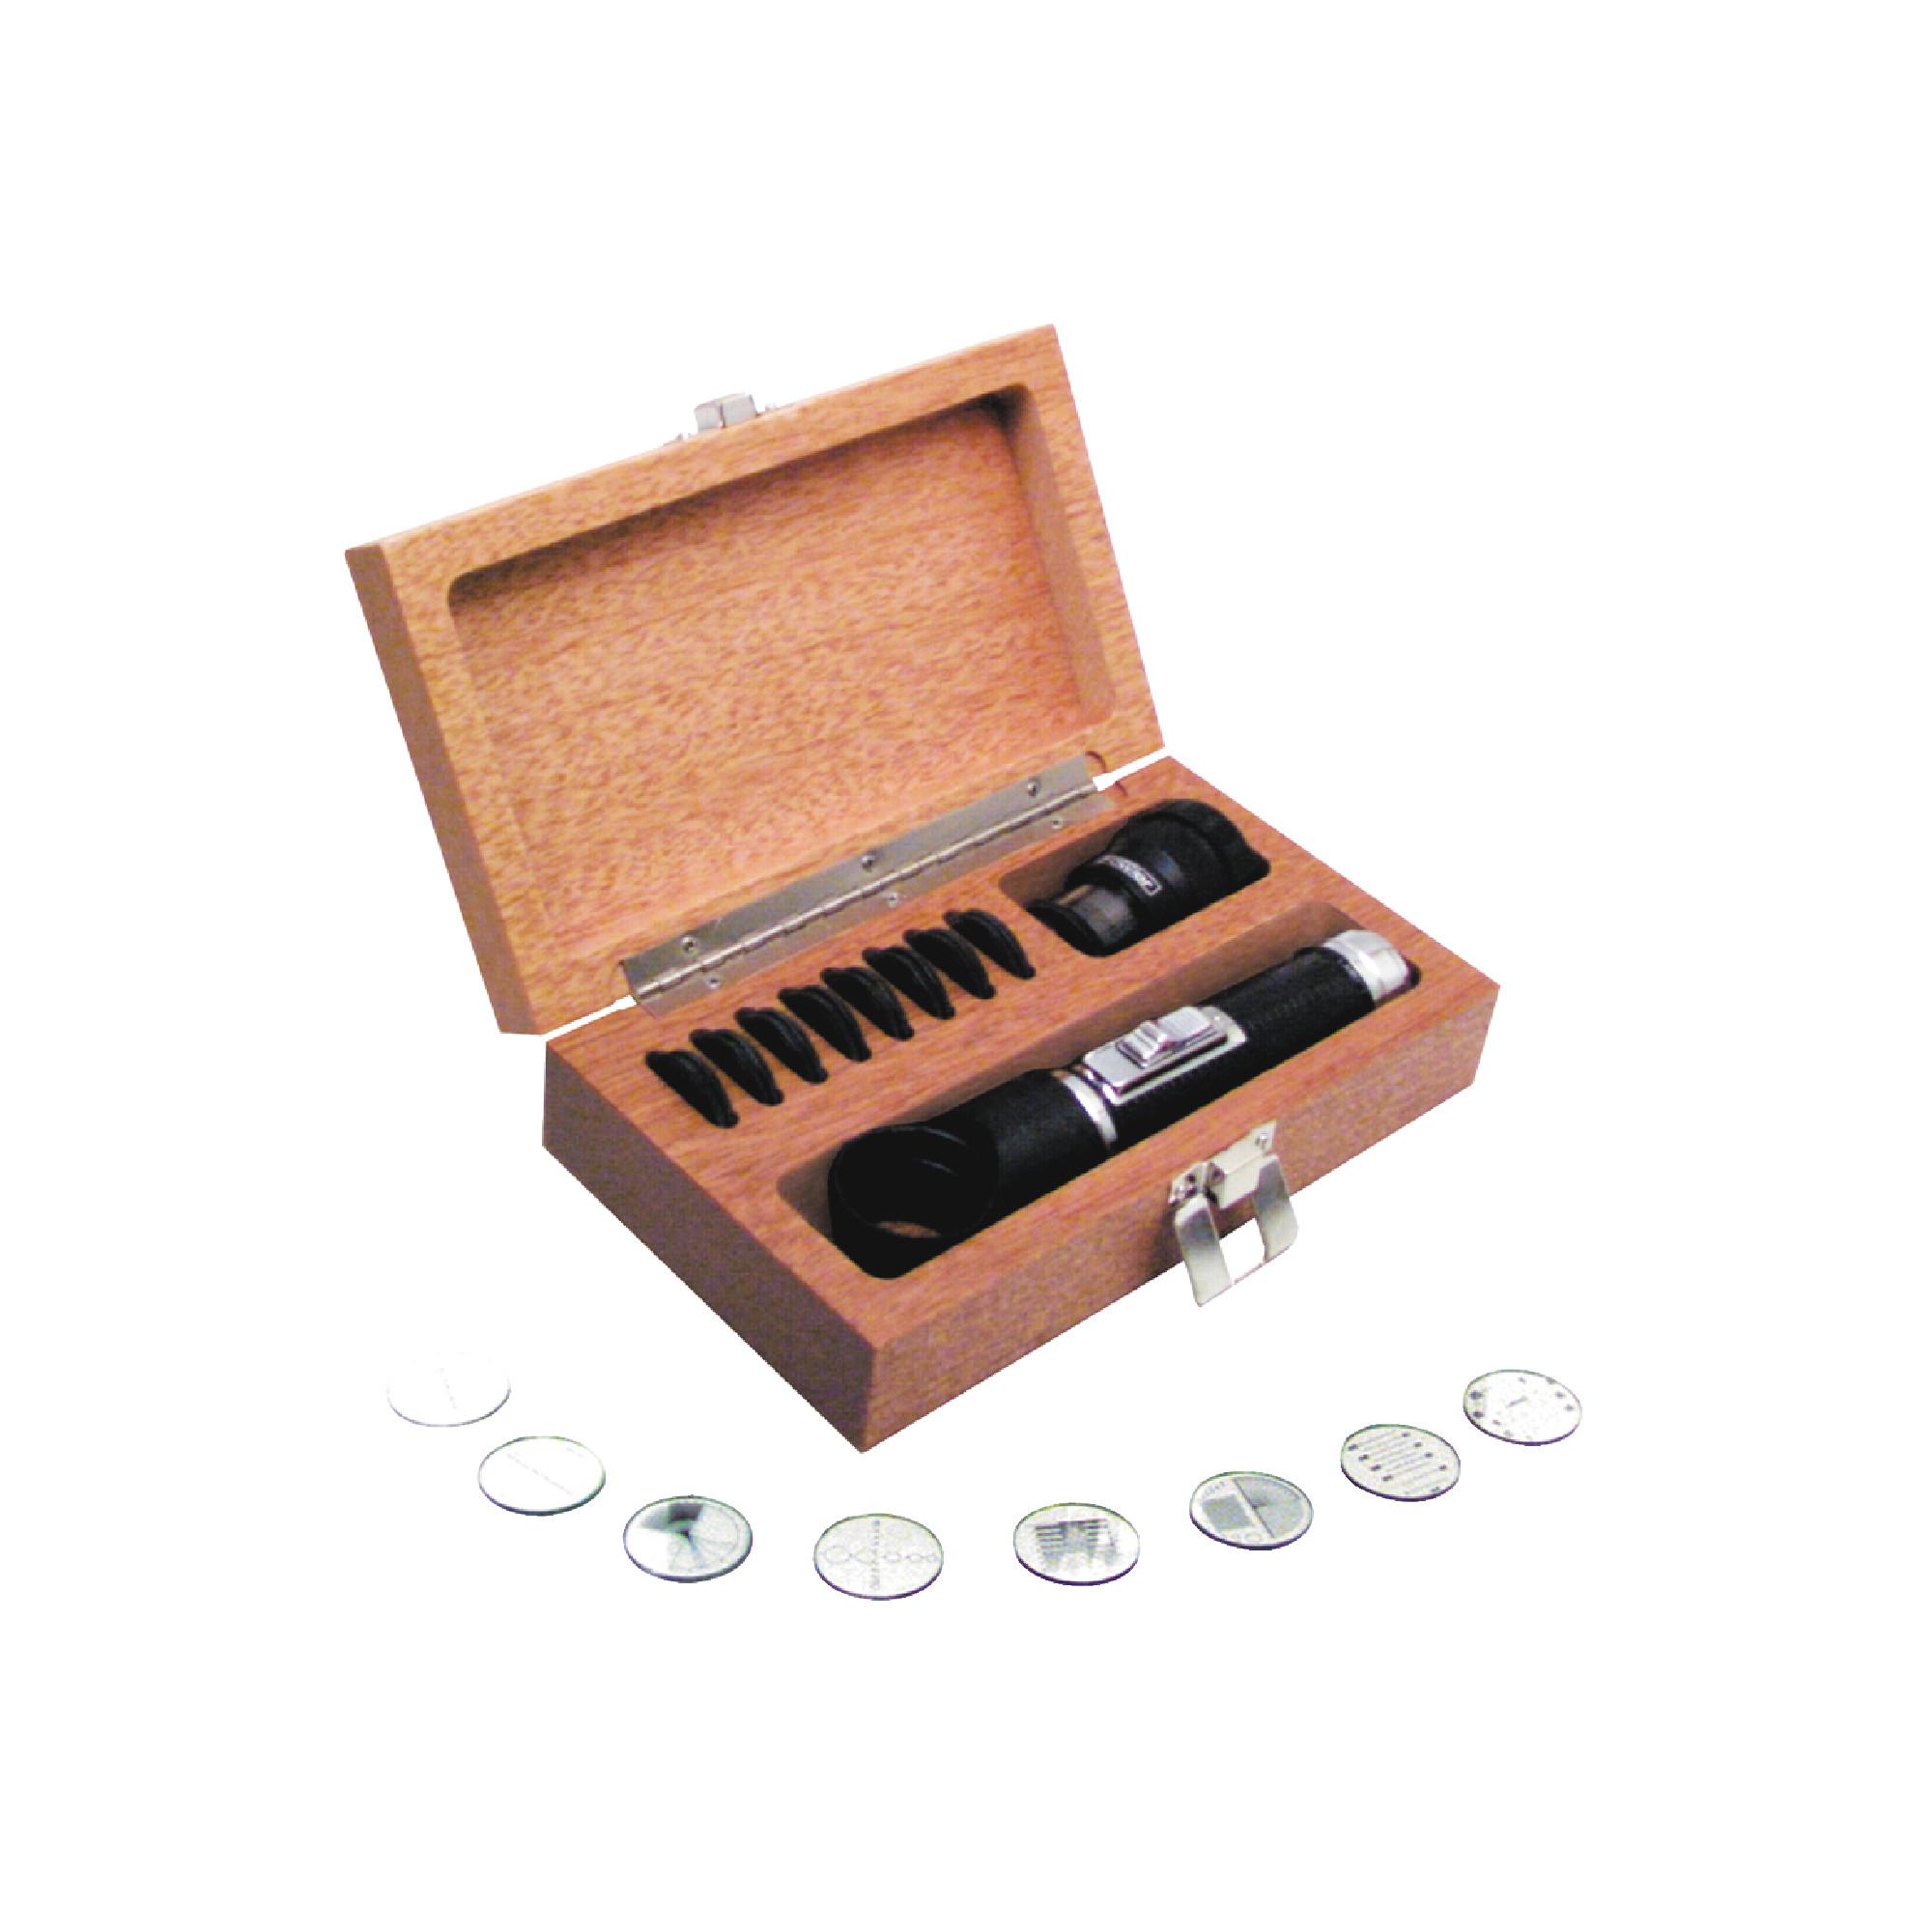 10X Pocket Optical Comparator Set